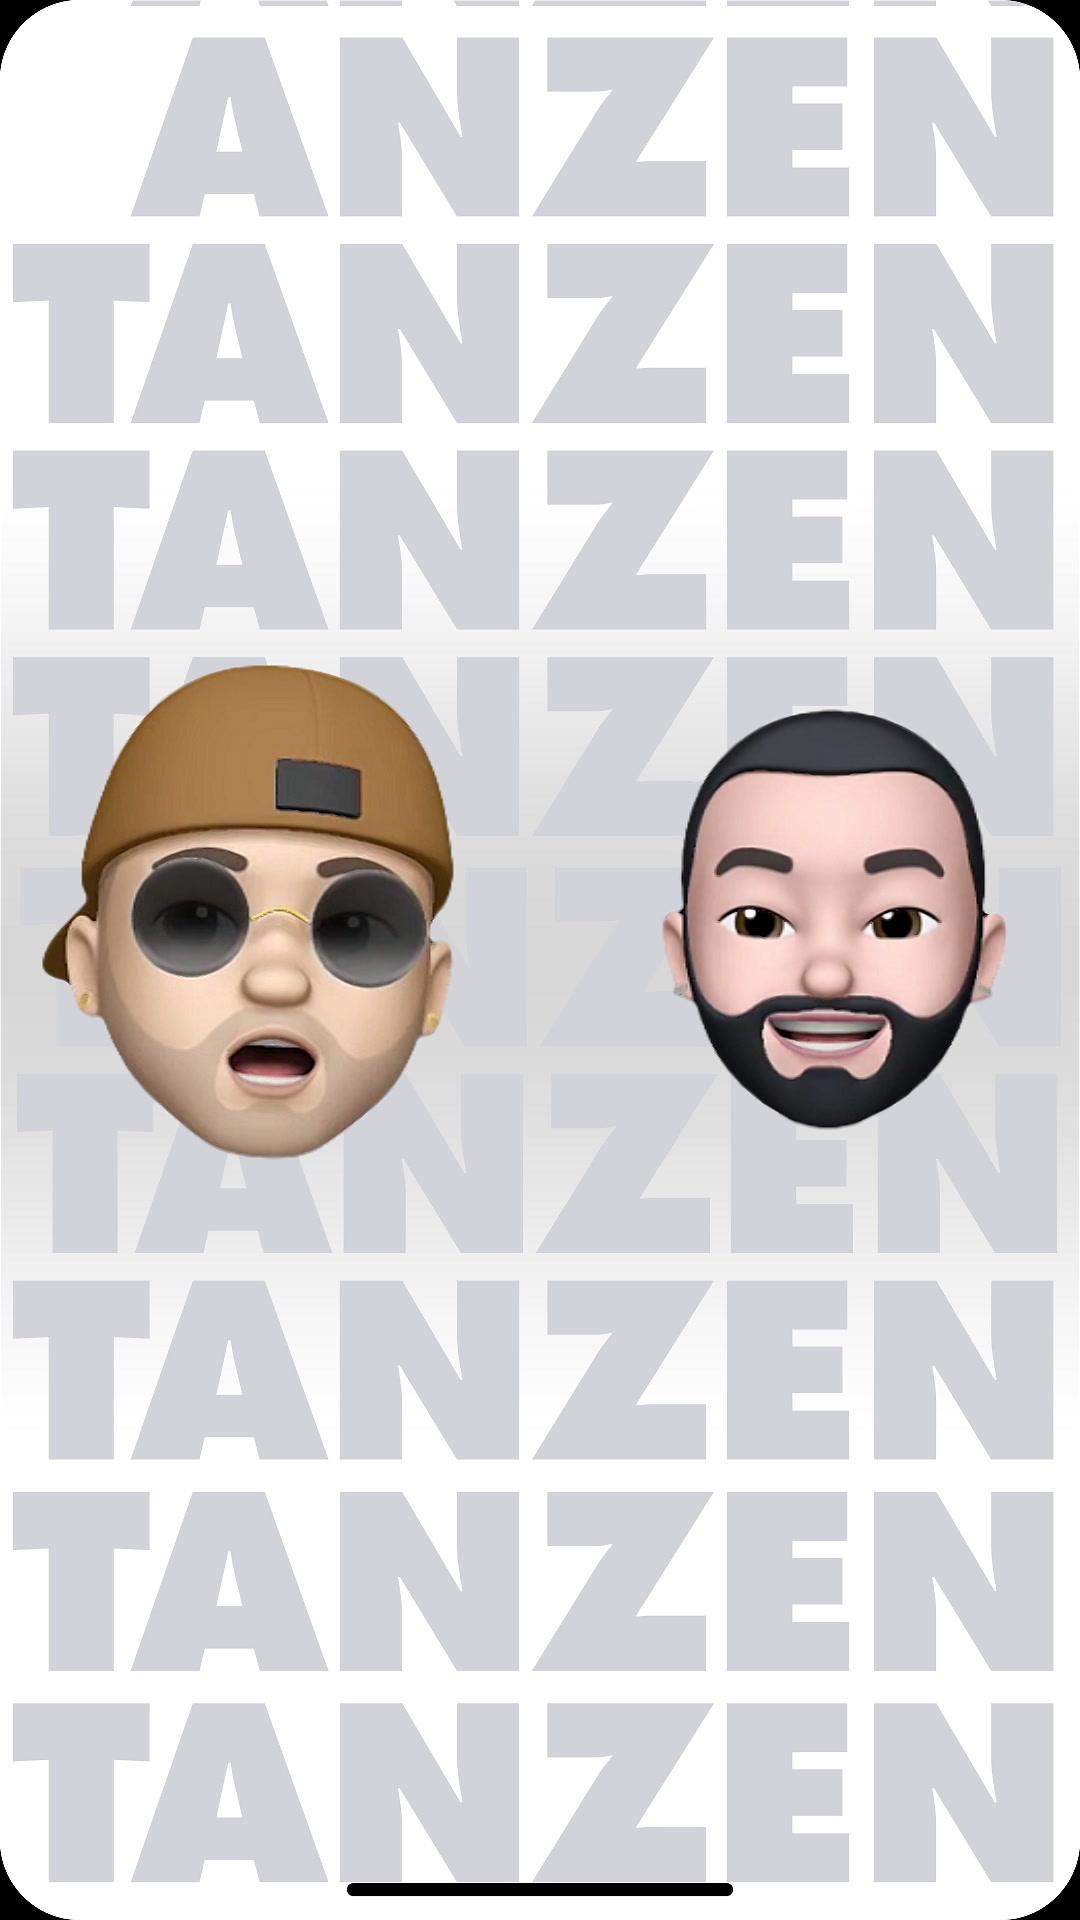 Tanzen / Baile - Edin, Manuel Turizo